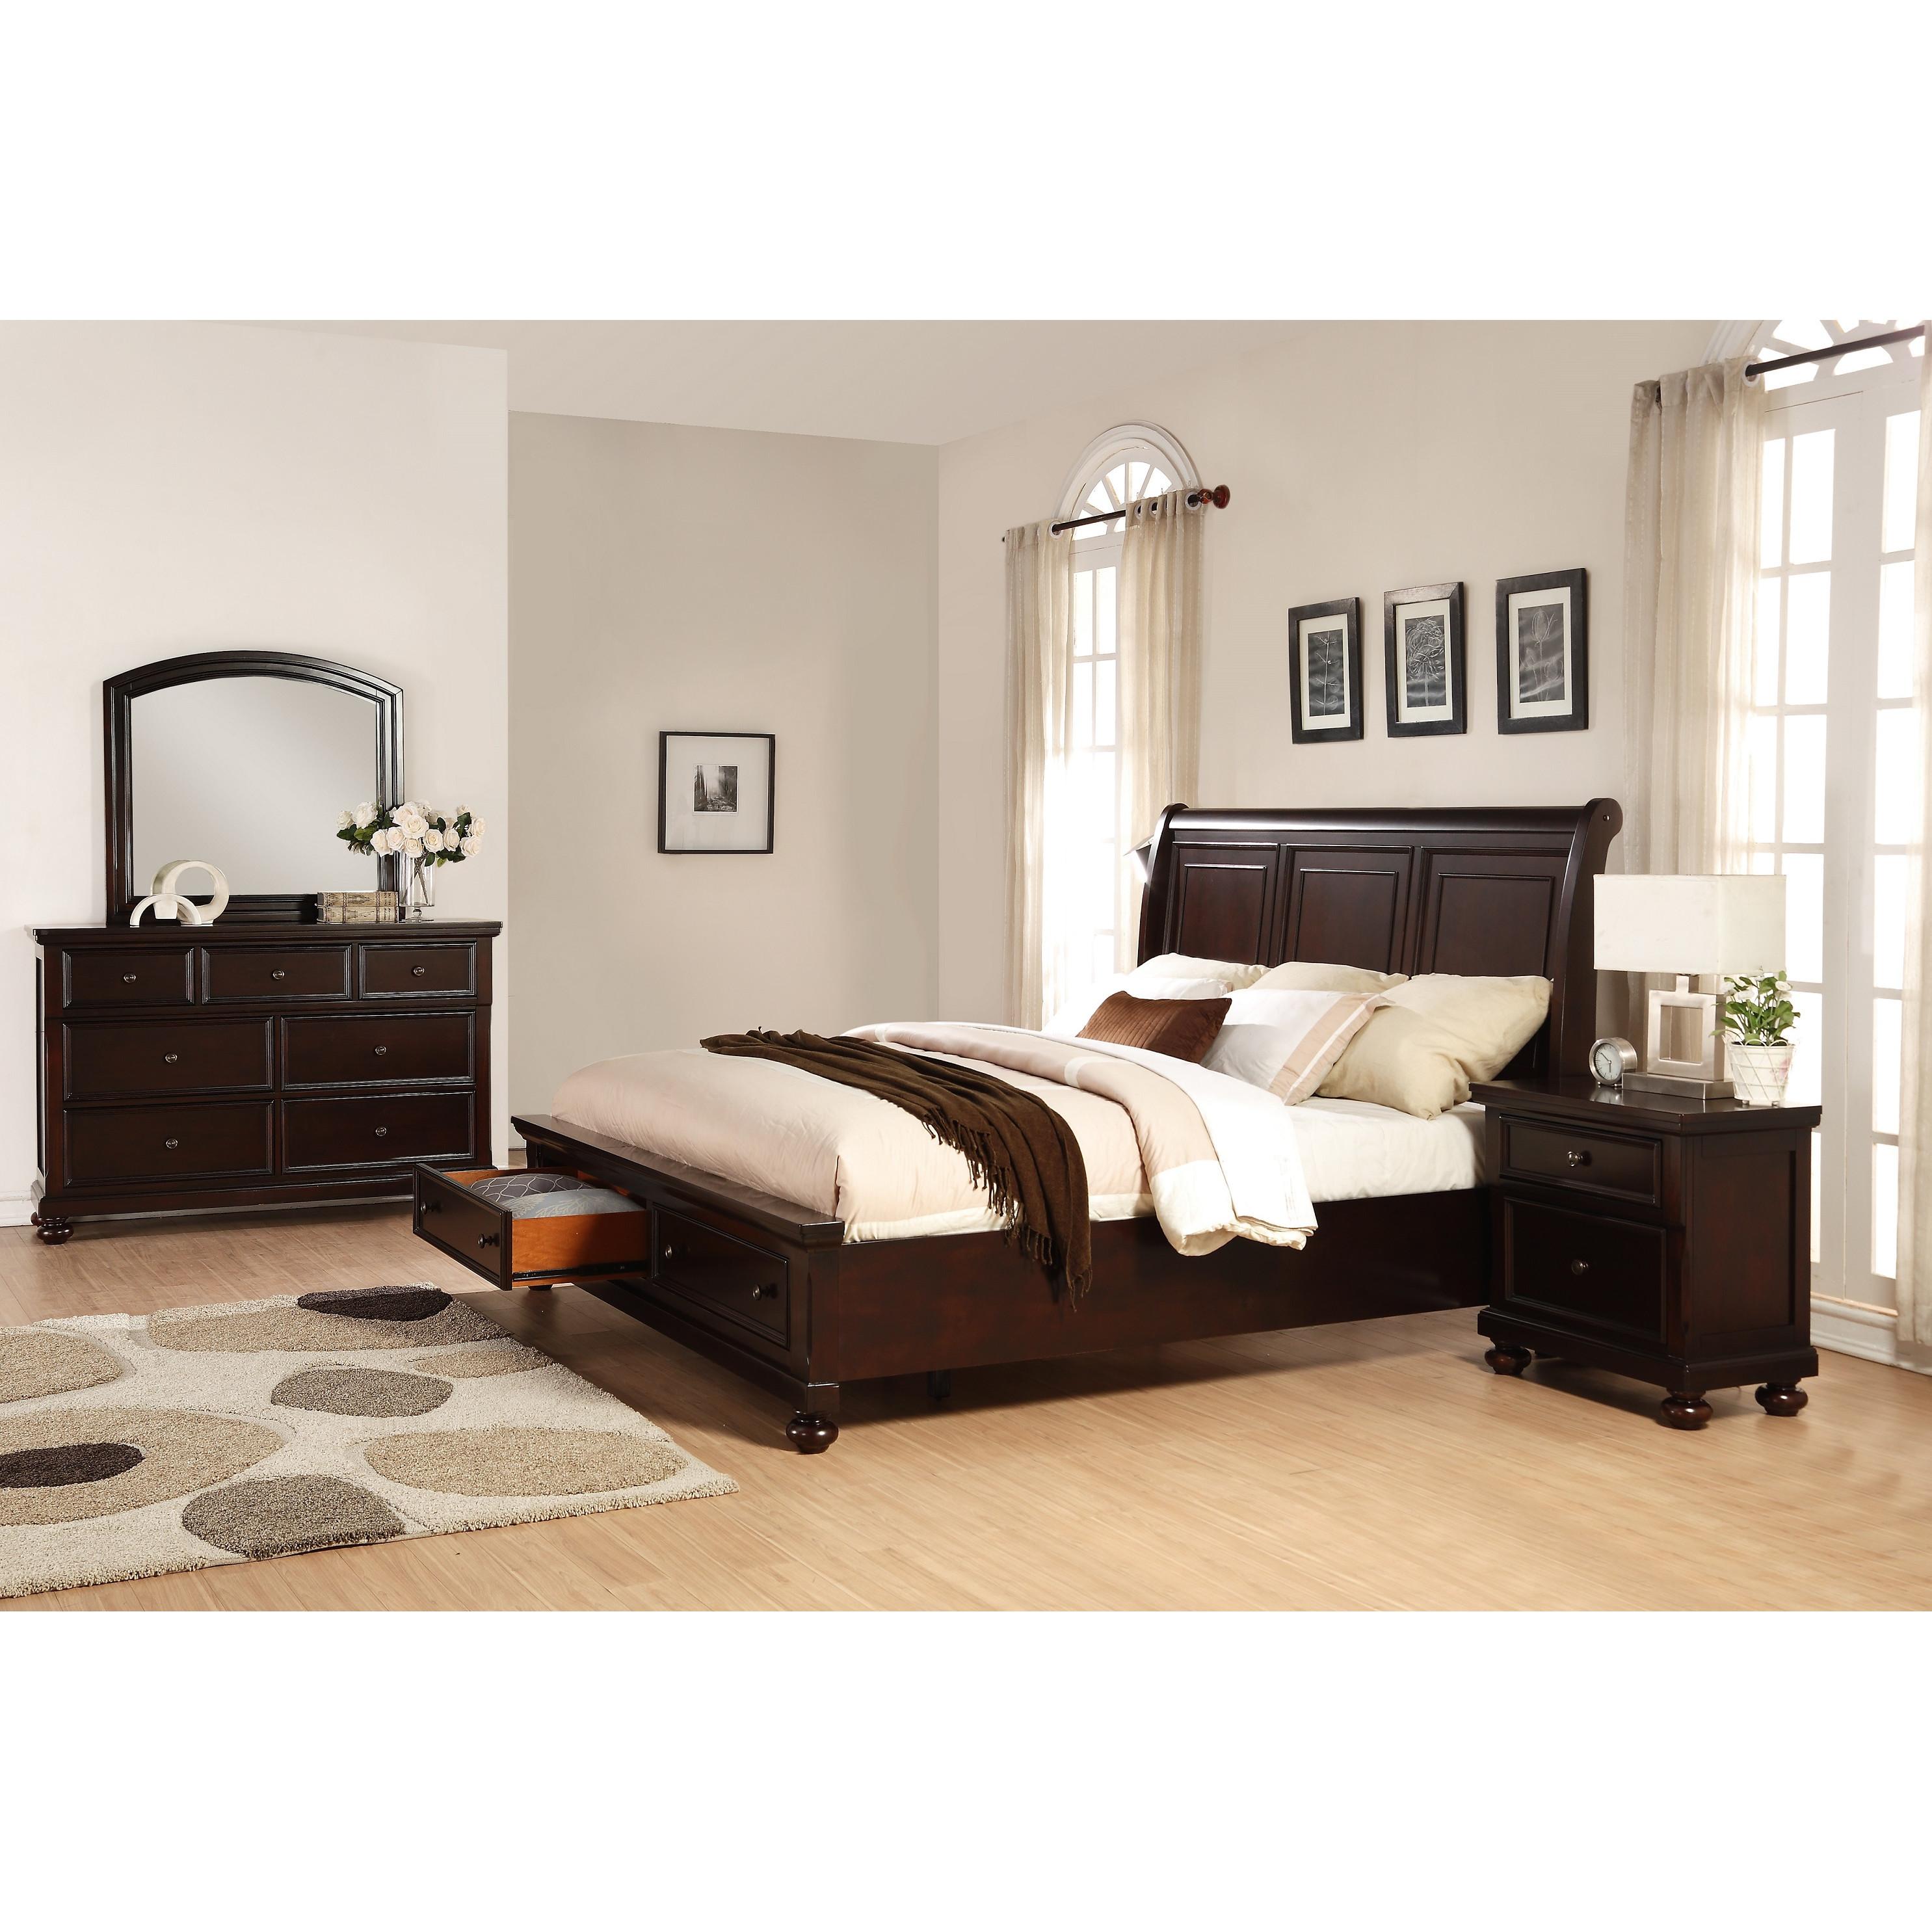 Best ideas about Wayfair Bedroom Sets . Save or Pin Roundhill Furniture Brishland Platform 4 Piece Bedroom Set Now.